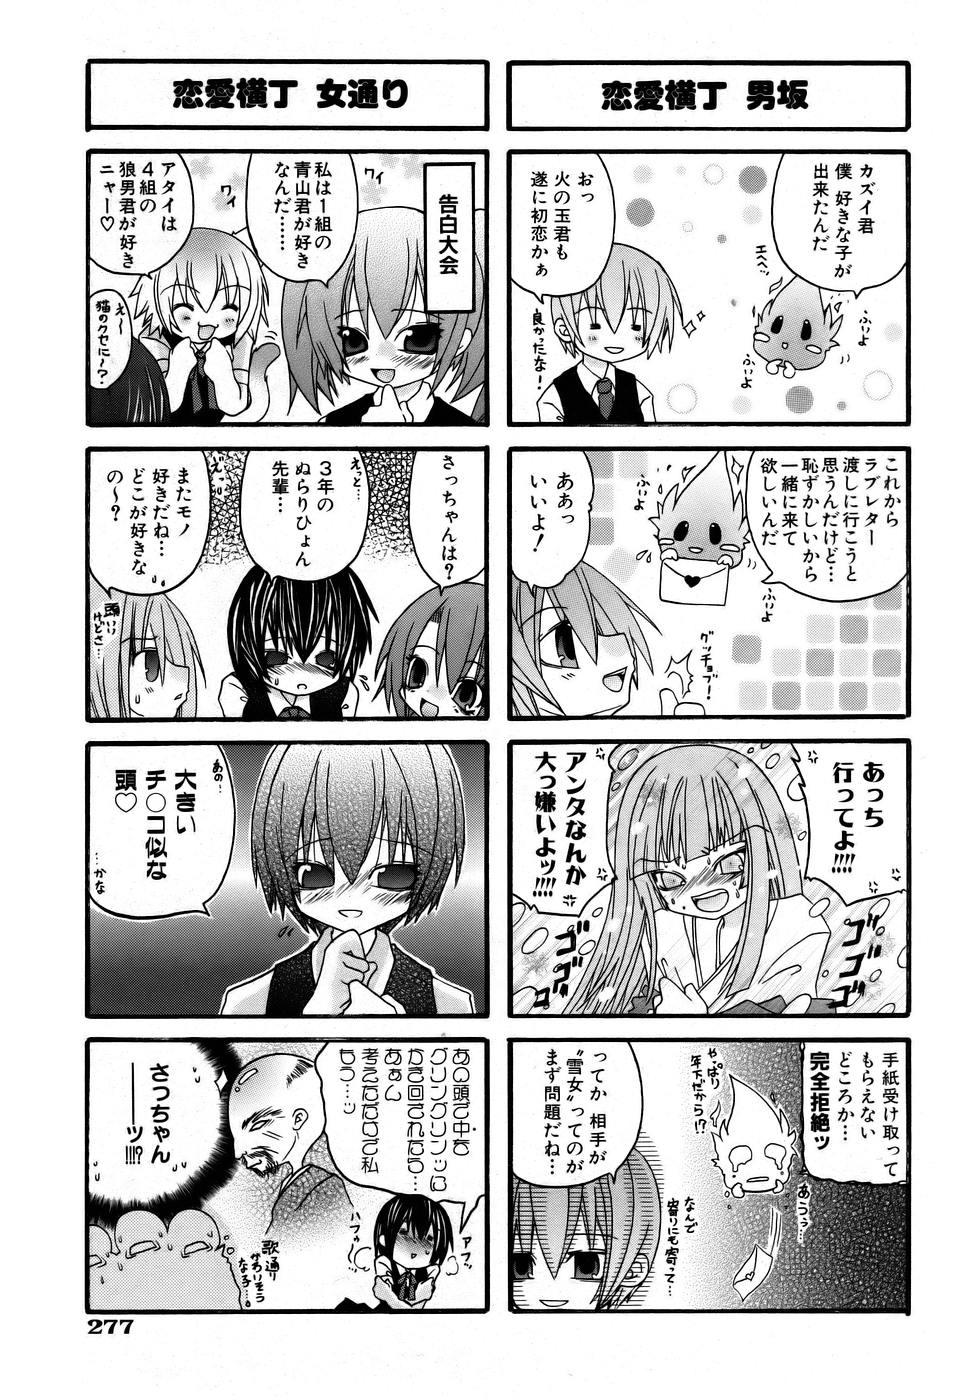 COMIC AUN 2005-12 Vol. 115 274